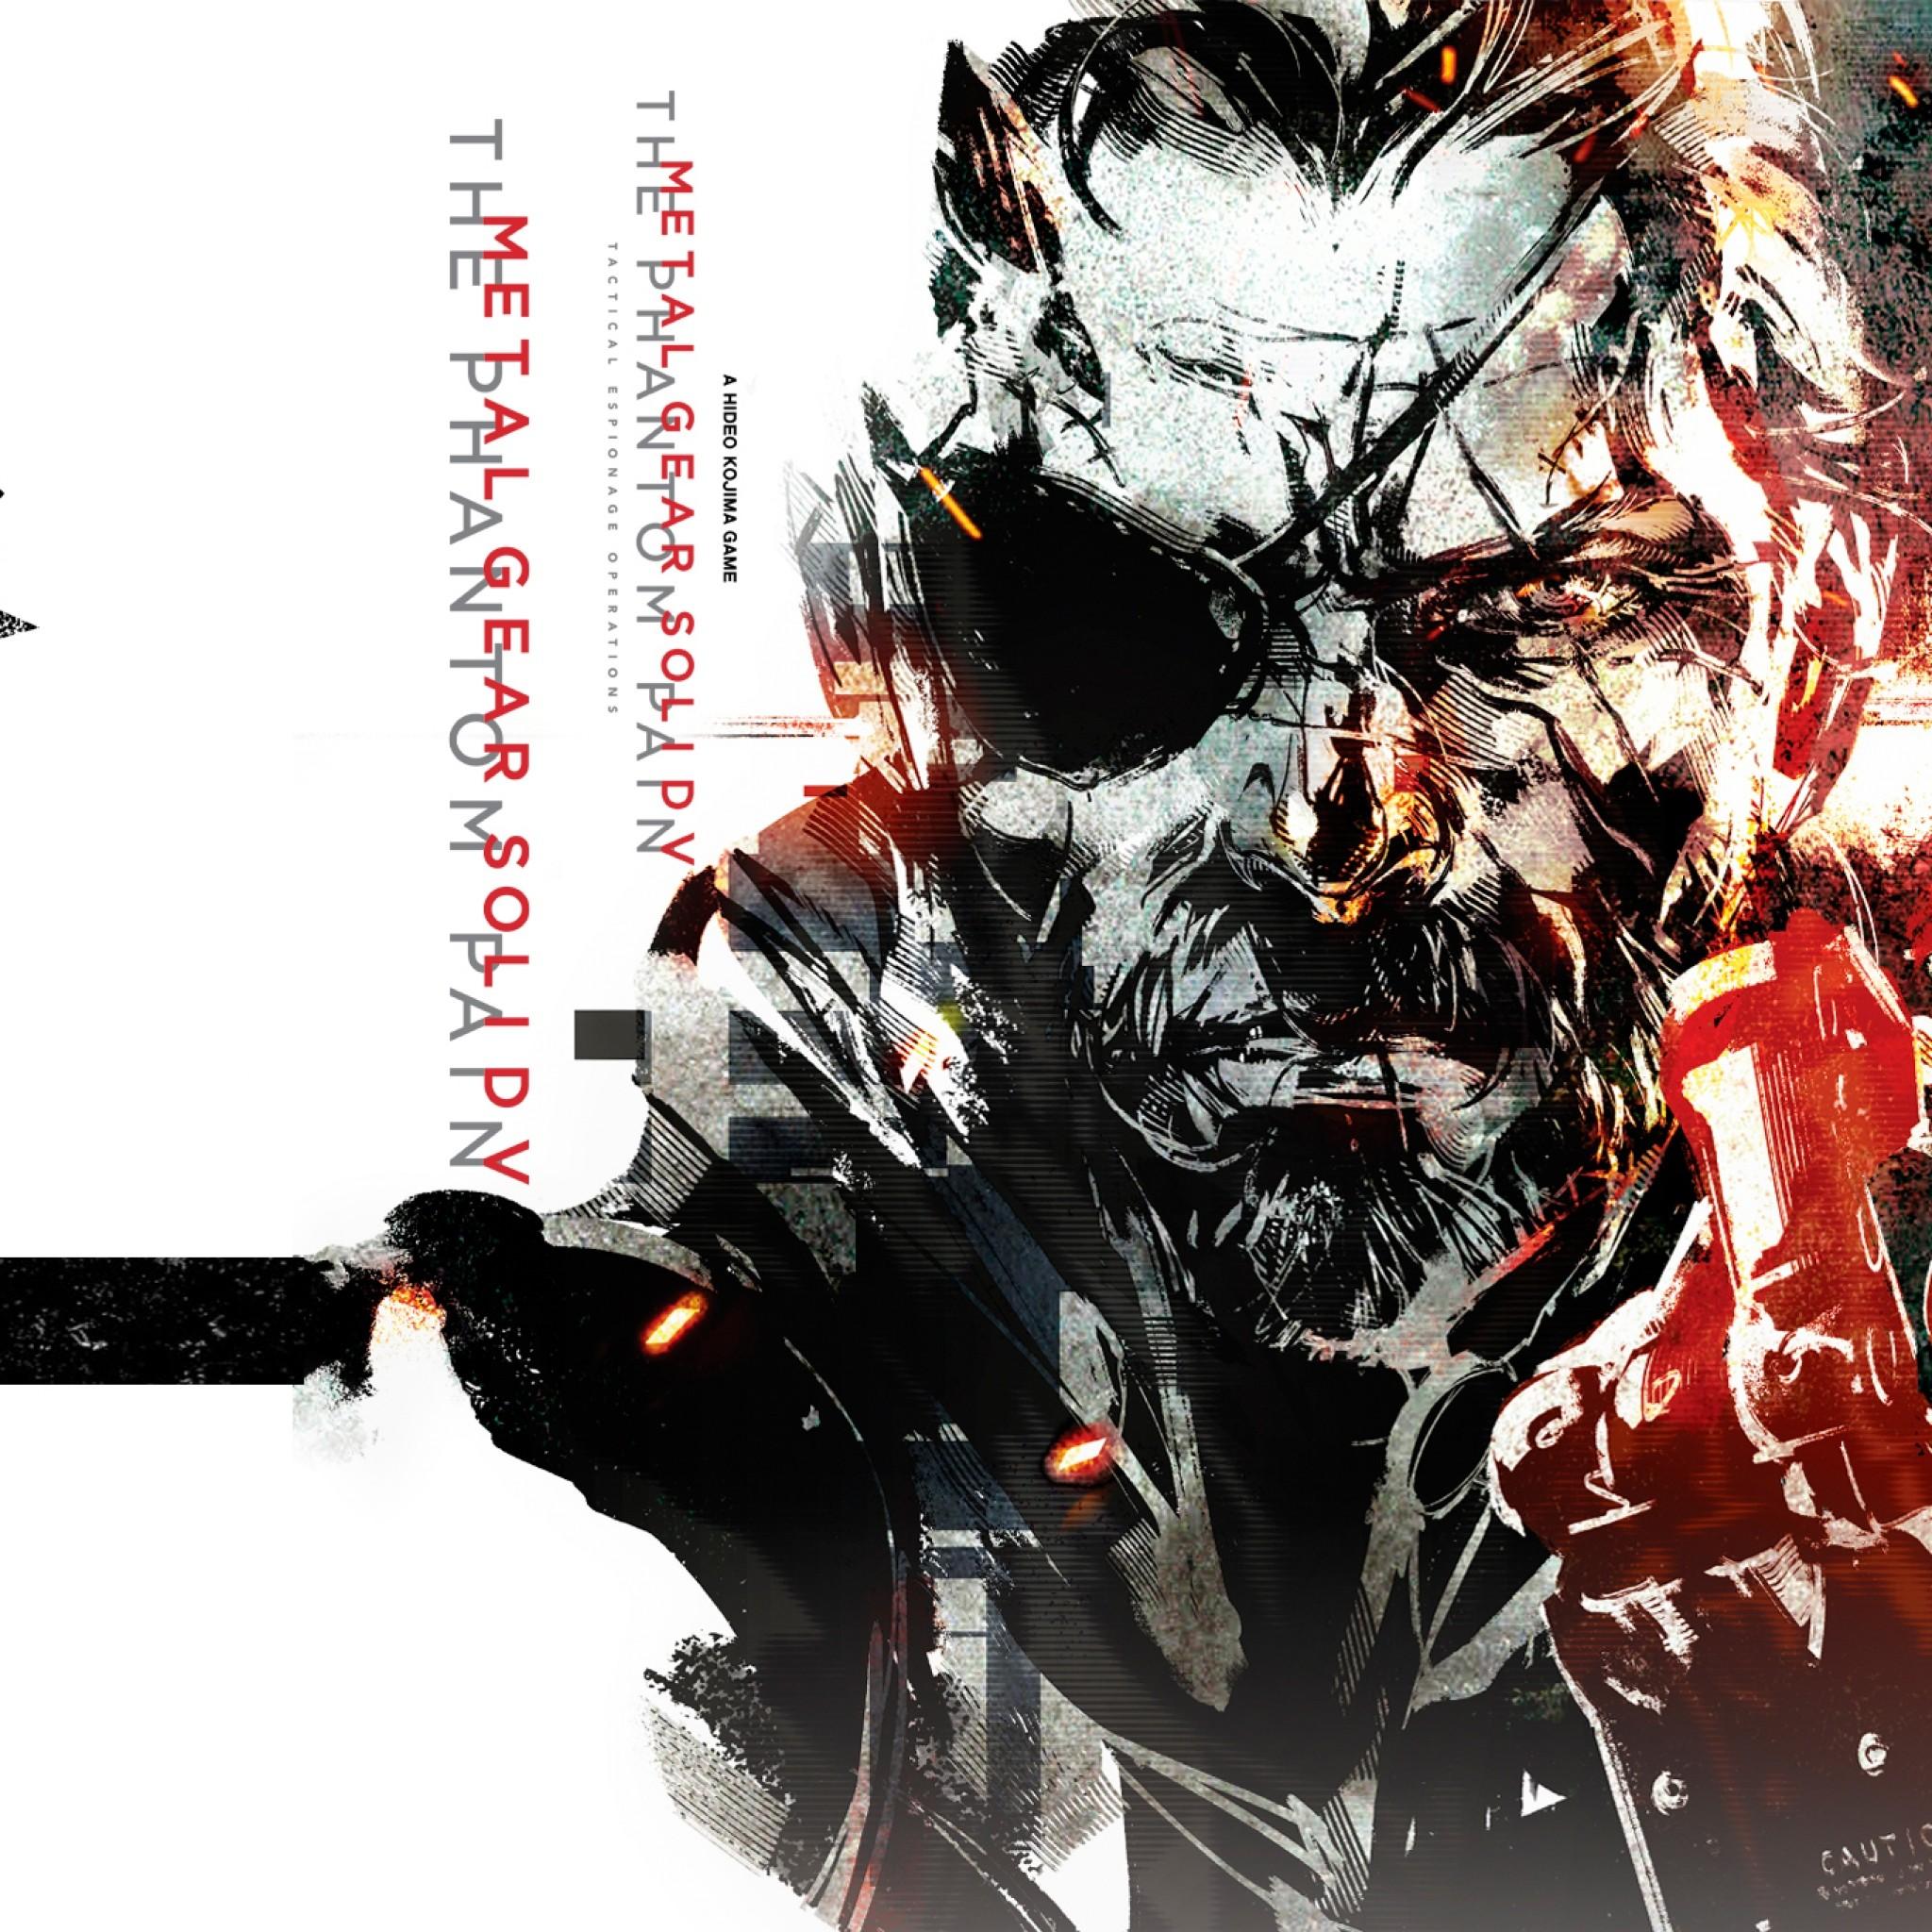 Preview wallpaper metal gear solid v, the phantom pain, art 2048×2048